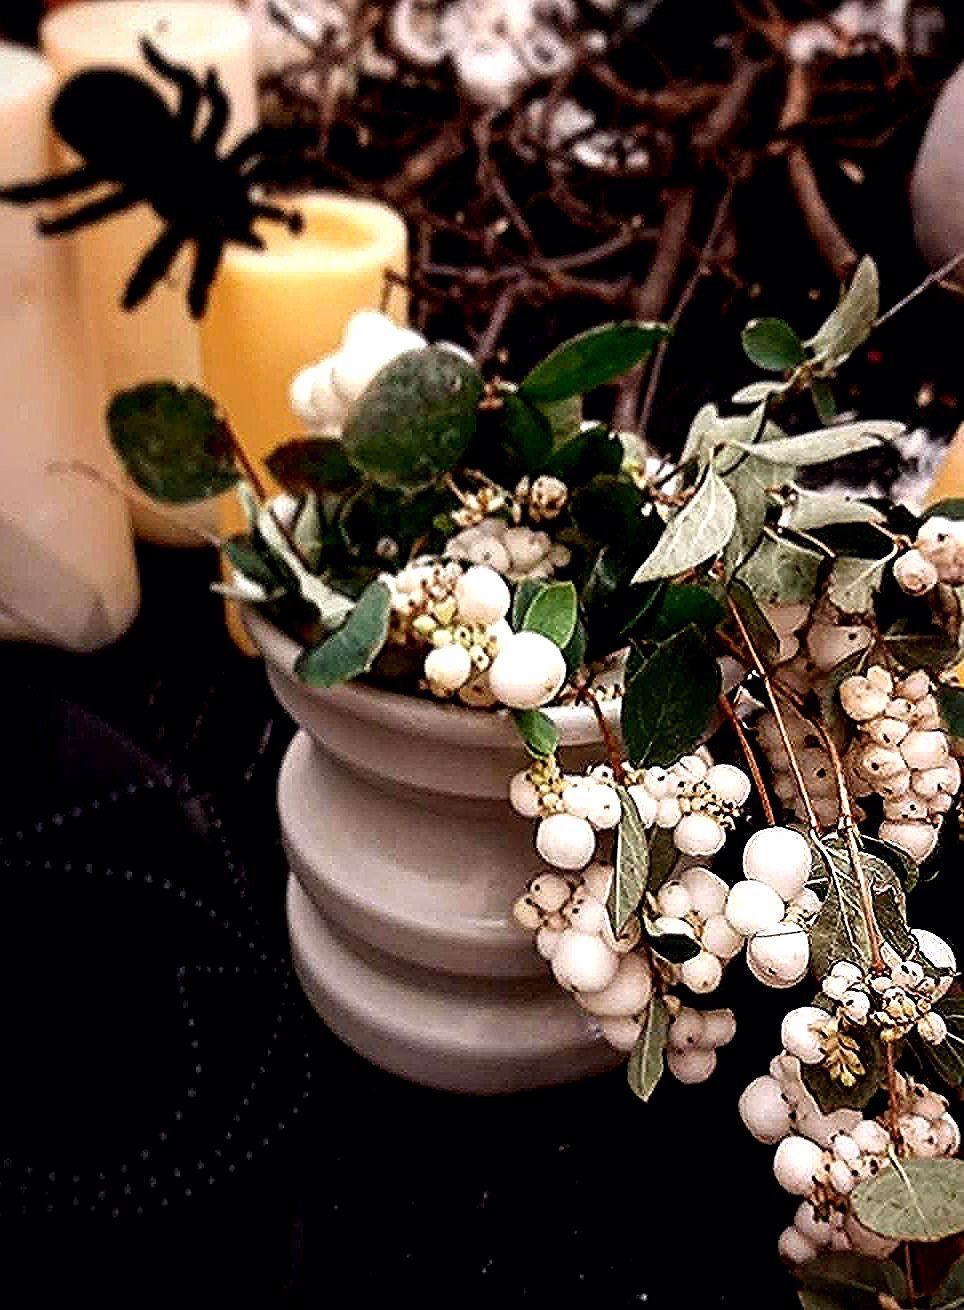 #liliaceae #flowers #flowerdesign #flowerdecor #floral #floraldesign #floral #florist #flowerart #flower_daily #flowerstagram #bouquet #flowerrunner #floweraddict #happyhalloween 🎃  #گل #گلدان #گلارایی #گلارایی_ایونت #دسته_گل #دستهگل_فانتزی #دسته_گل_نامزدی #دسته_گل_عروس #لیلیاسه